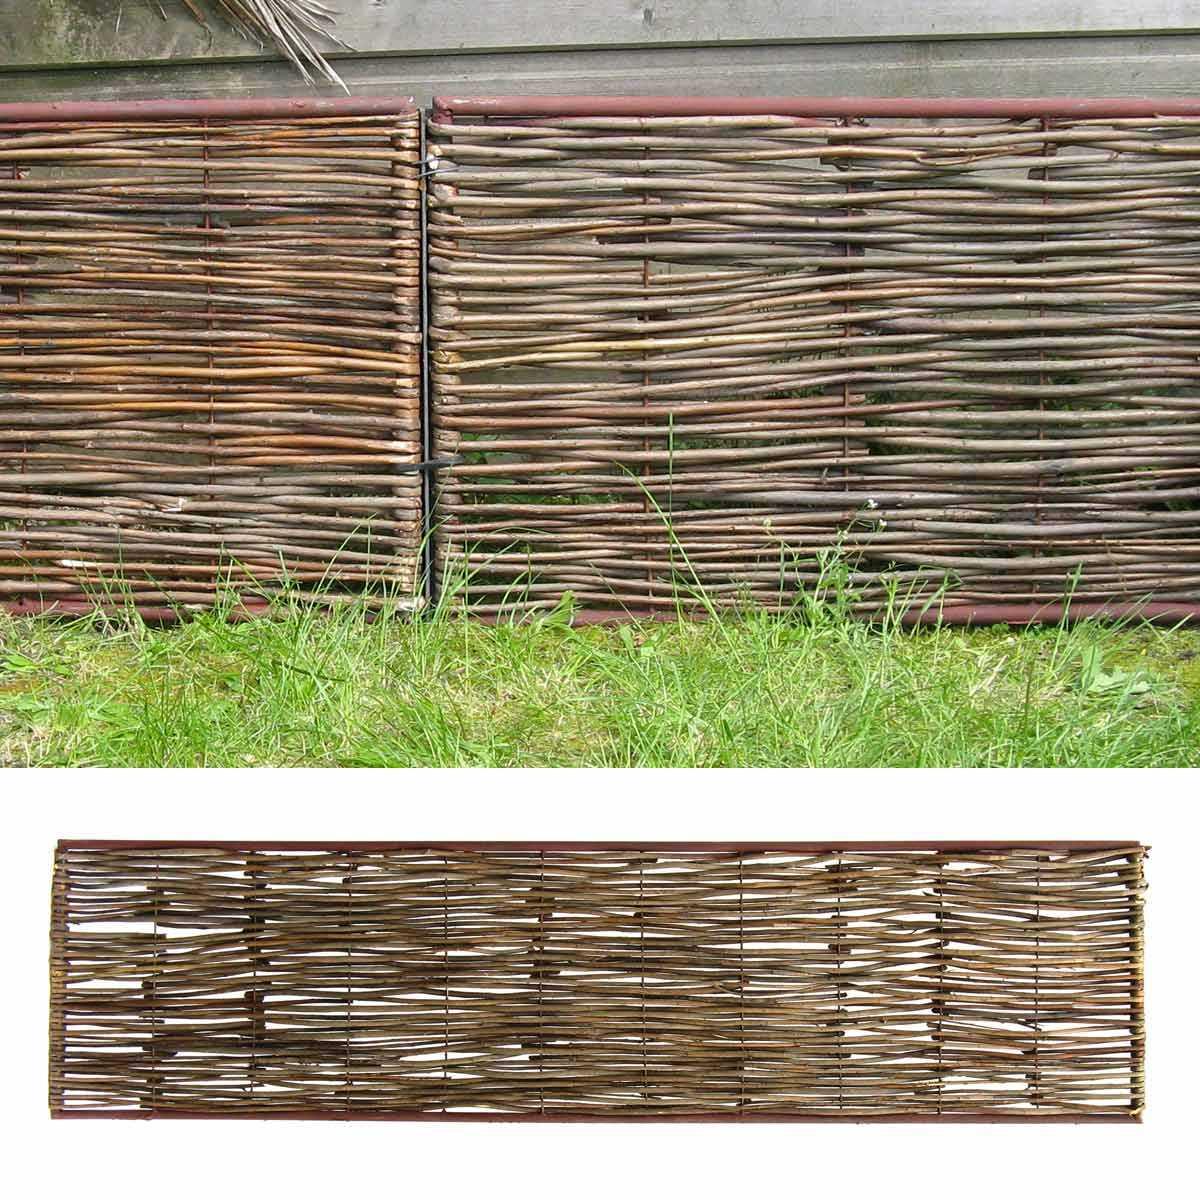 Bordure Médiévale Bois Acacia - Cadre Métal Haut.45Cm + Tige à Bordure Jardin Metal